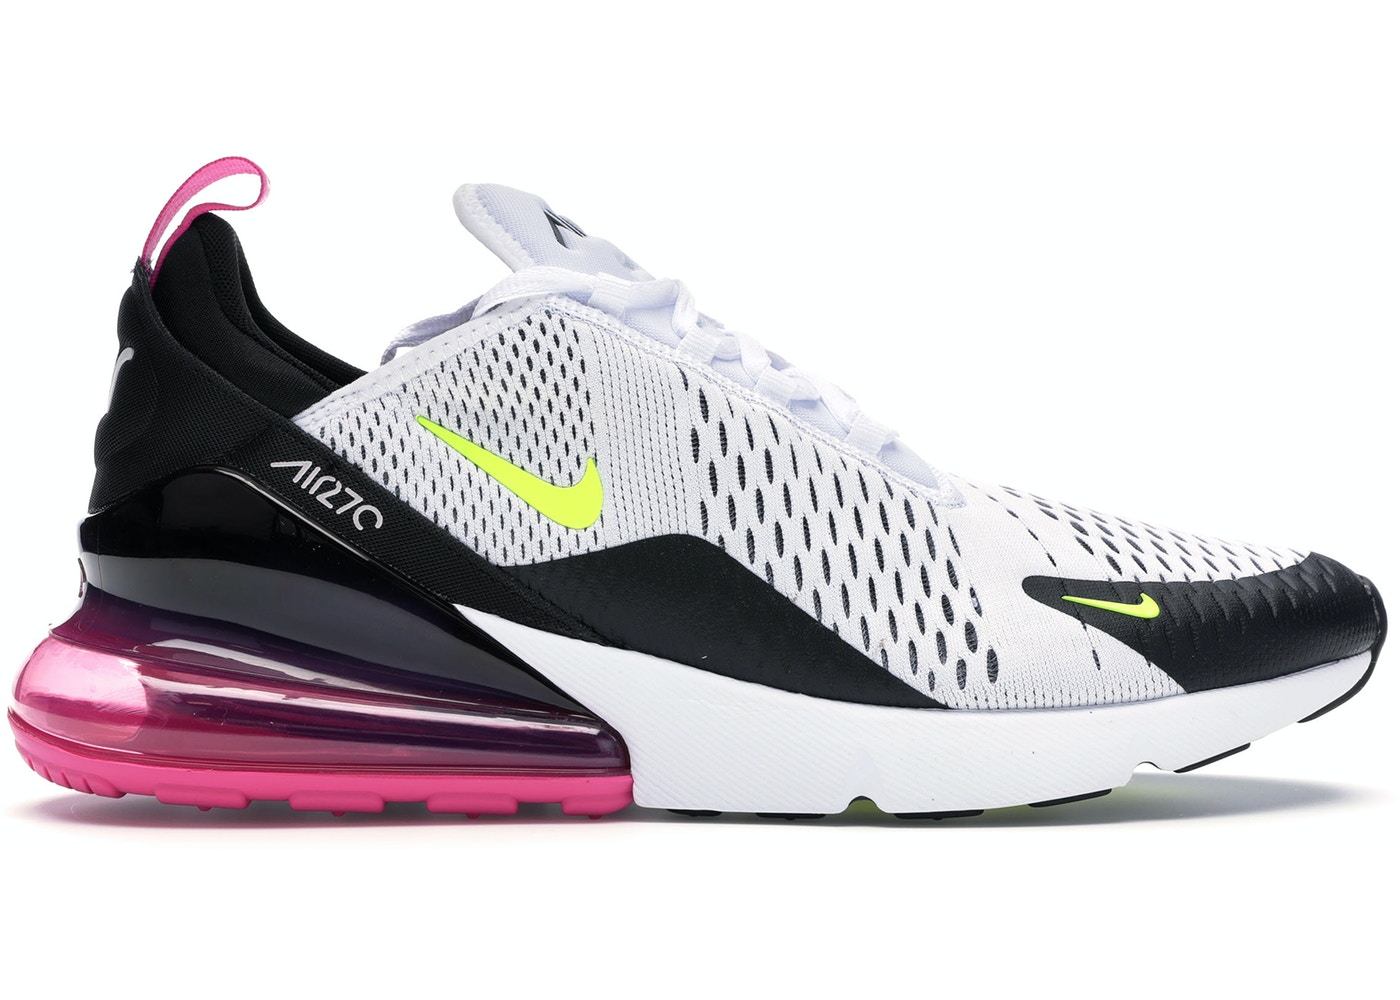 perdí mi camino Inhalar sistemático  Nike Air Max 270 White Black Fuchsia Volt - AH8050-109